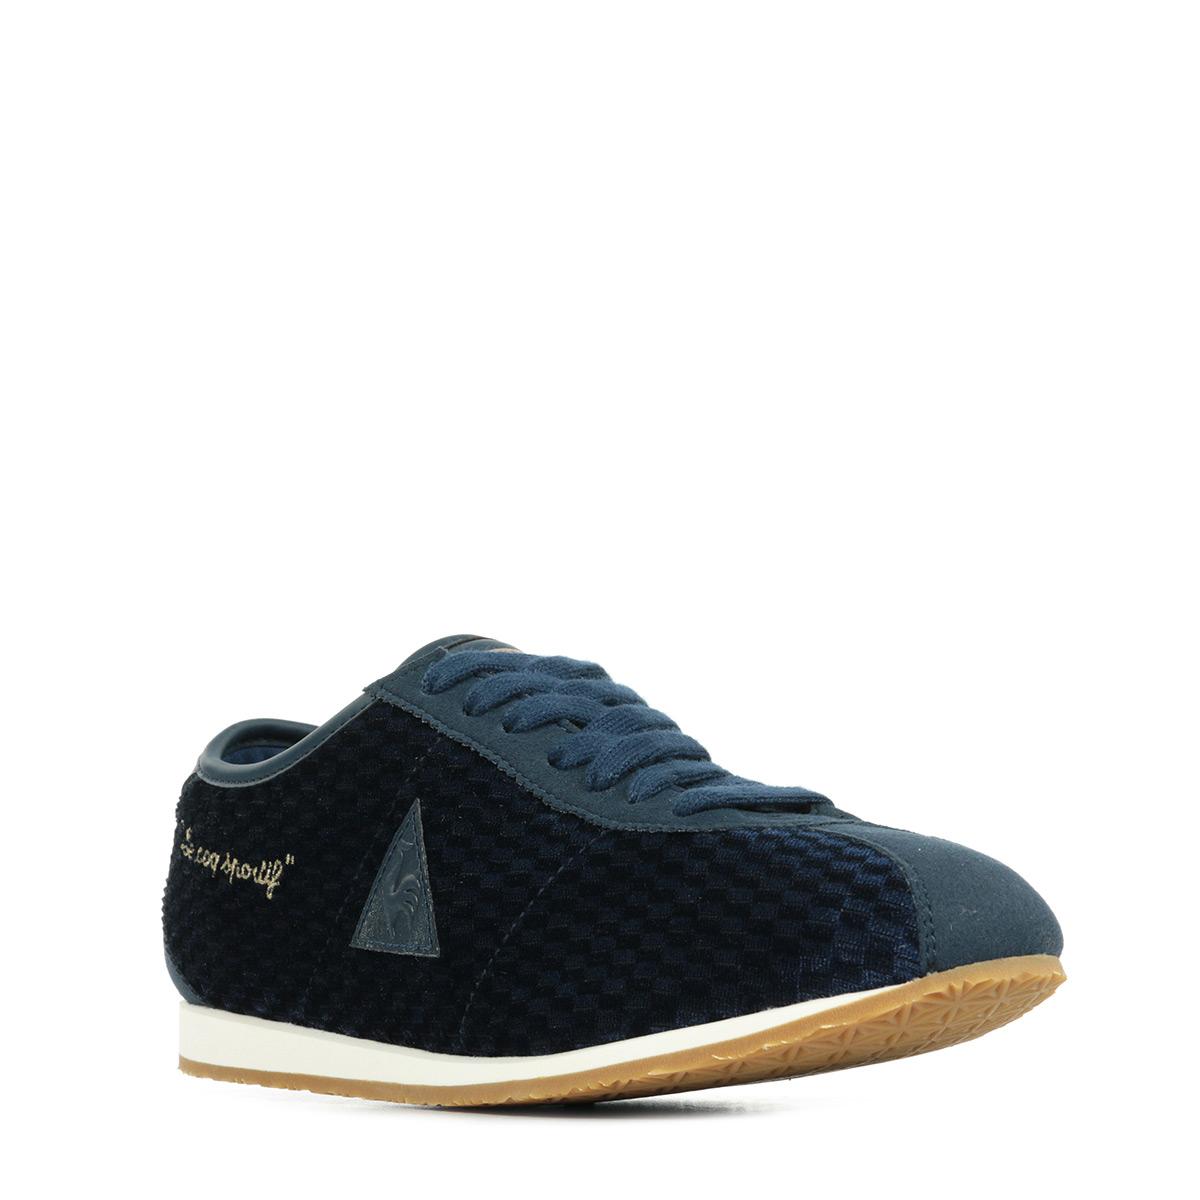 sneaker schuhe le coq sportif damen wendon w velvet blau ebay. Black Bedroom Furniture Sets. Home Design Ideas